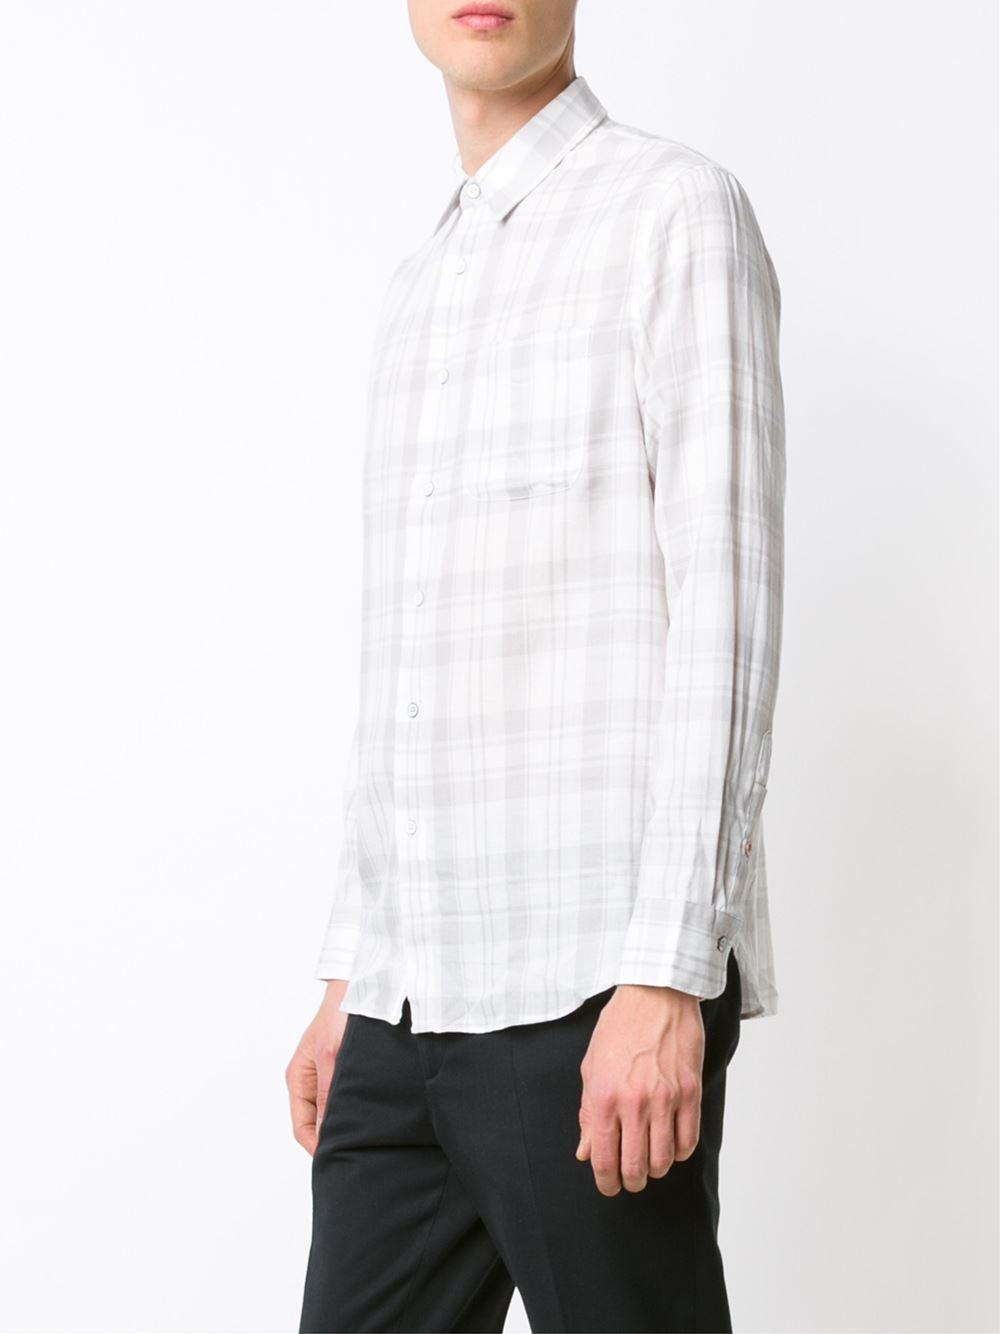 Rag bone beach shirt in white for men lyst for Rag and bone mens shirts sale